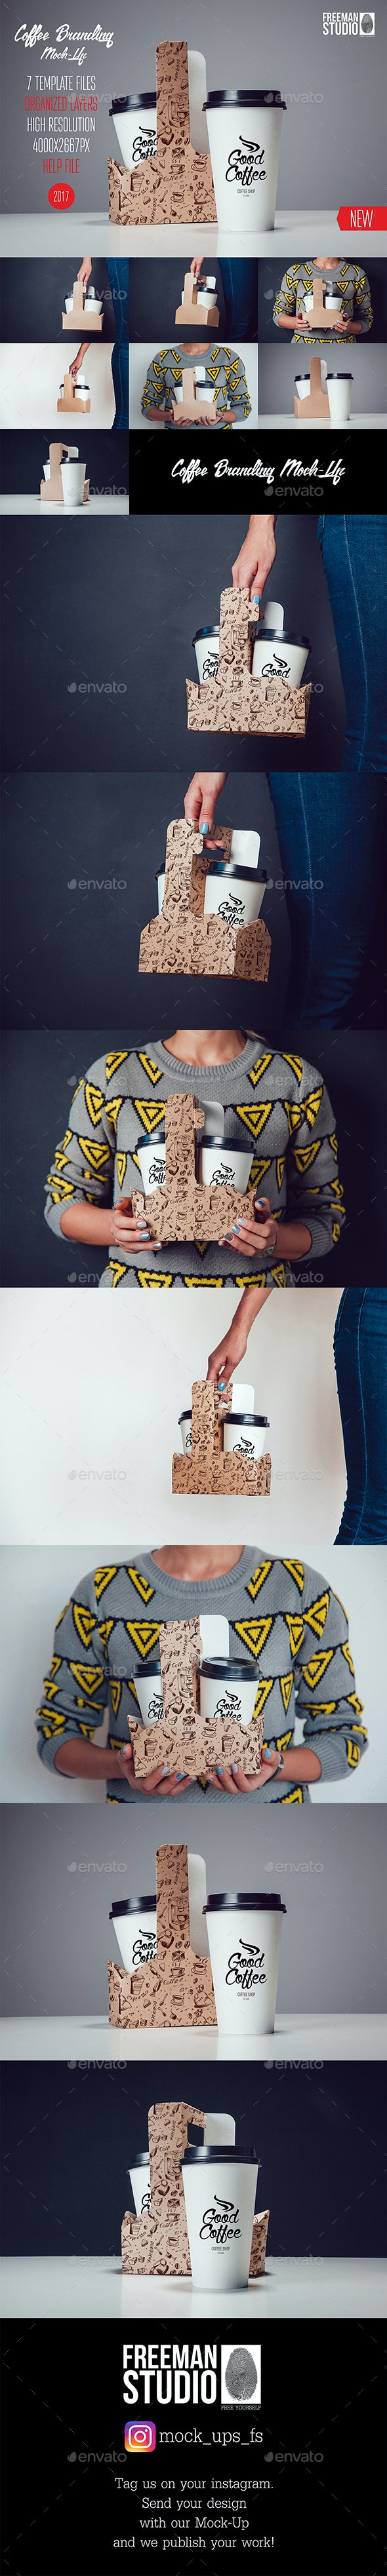 Coffee Branding Mock-Up Vol.4 - Product Mock-Ups Graphics